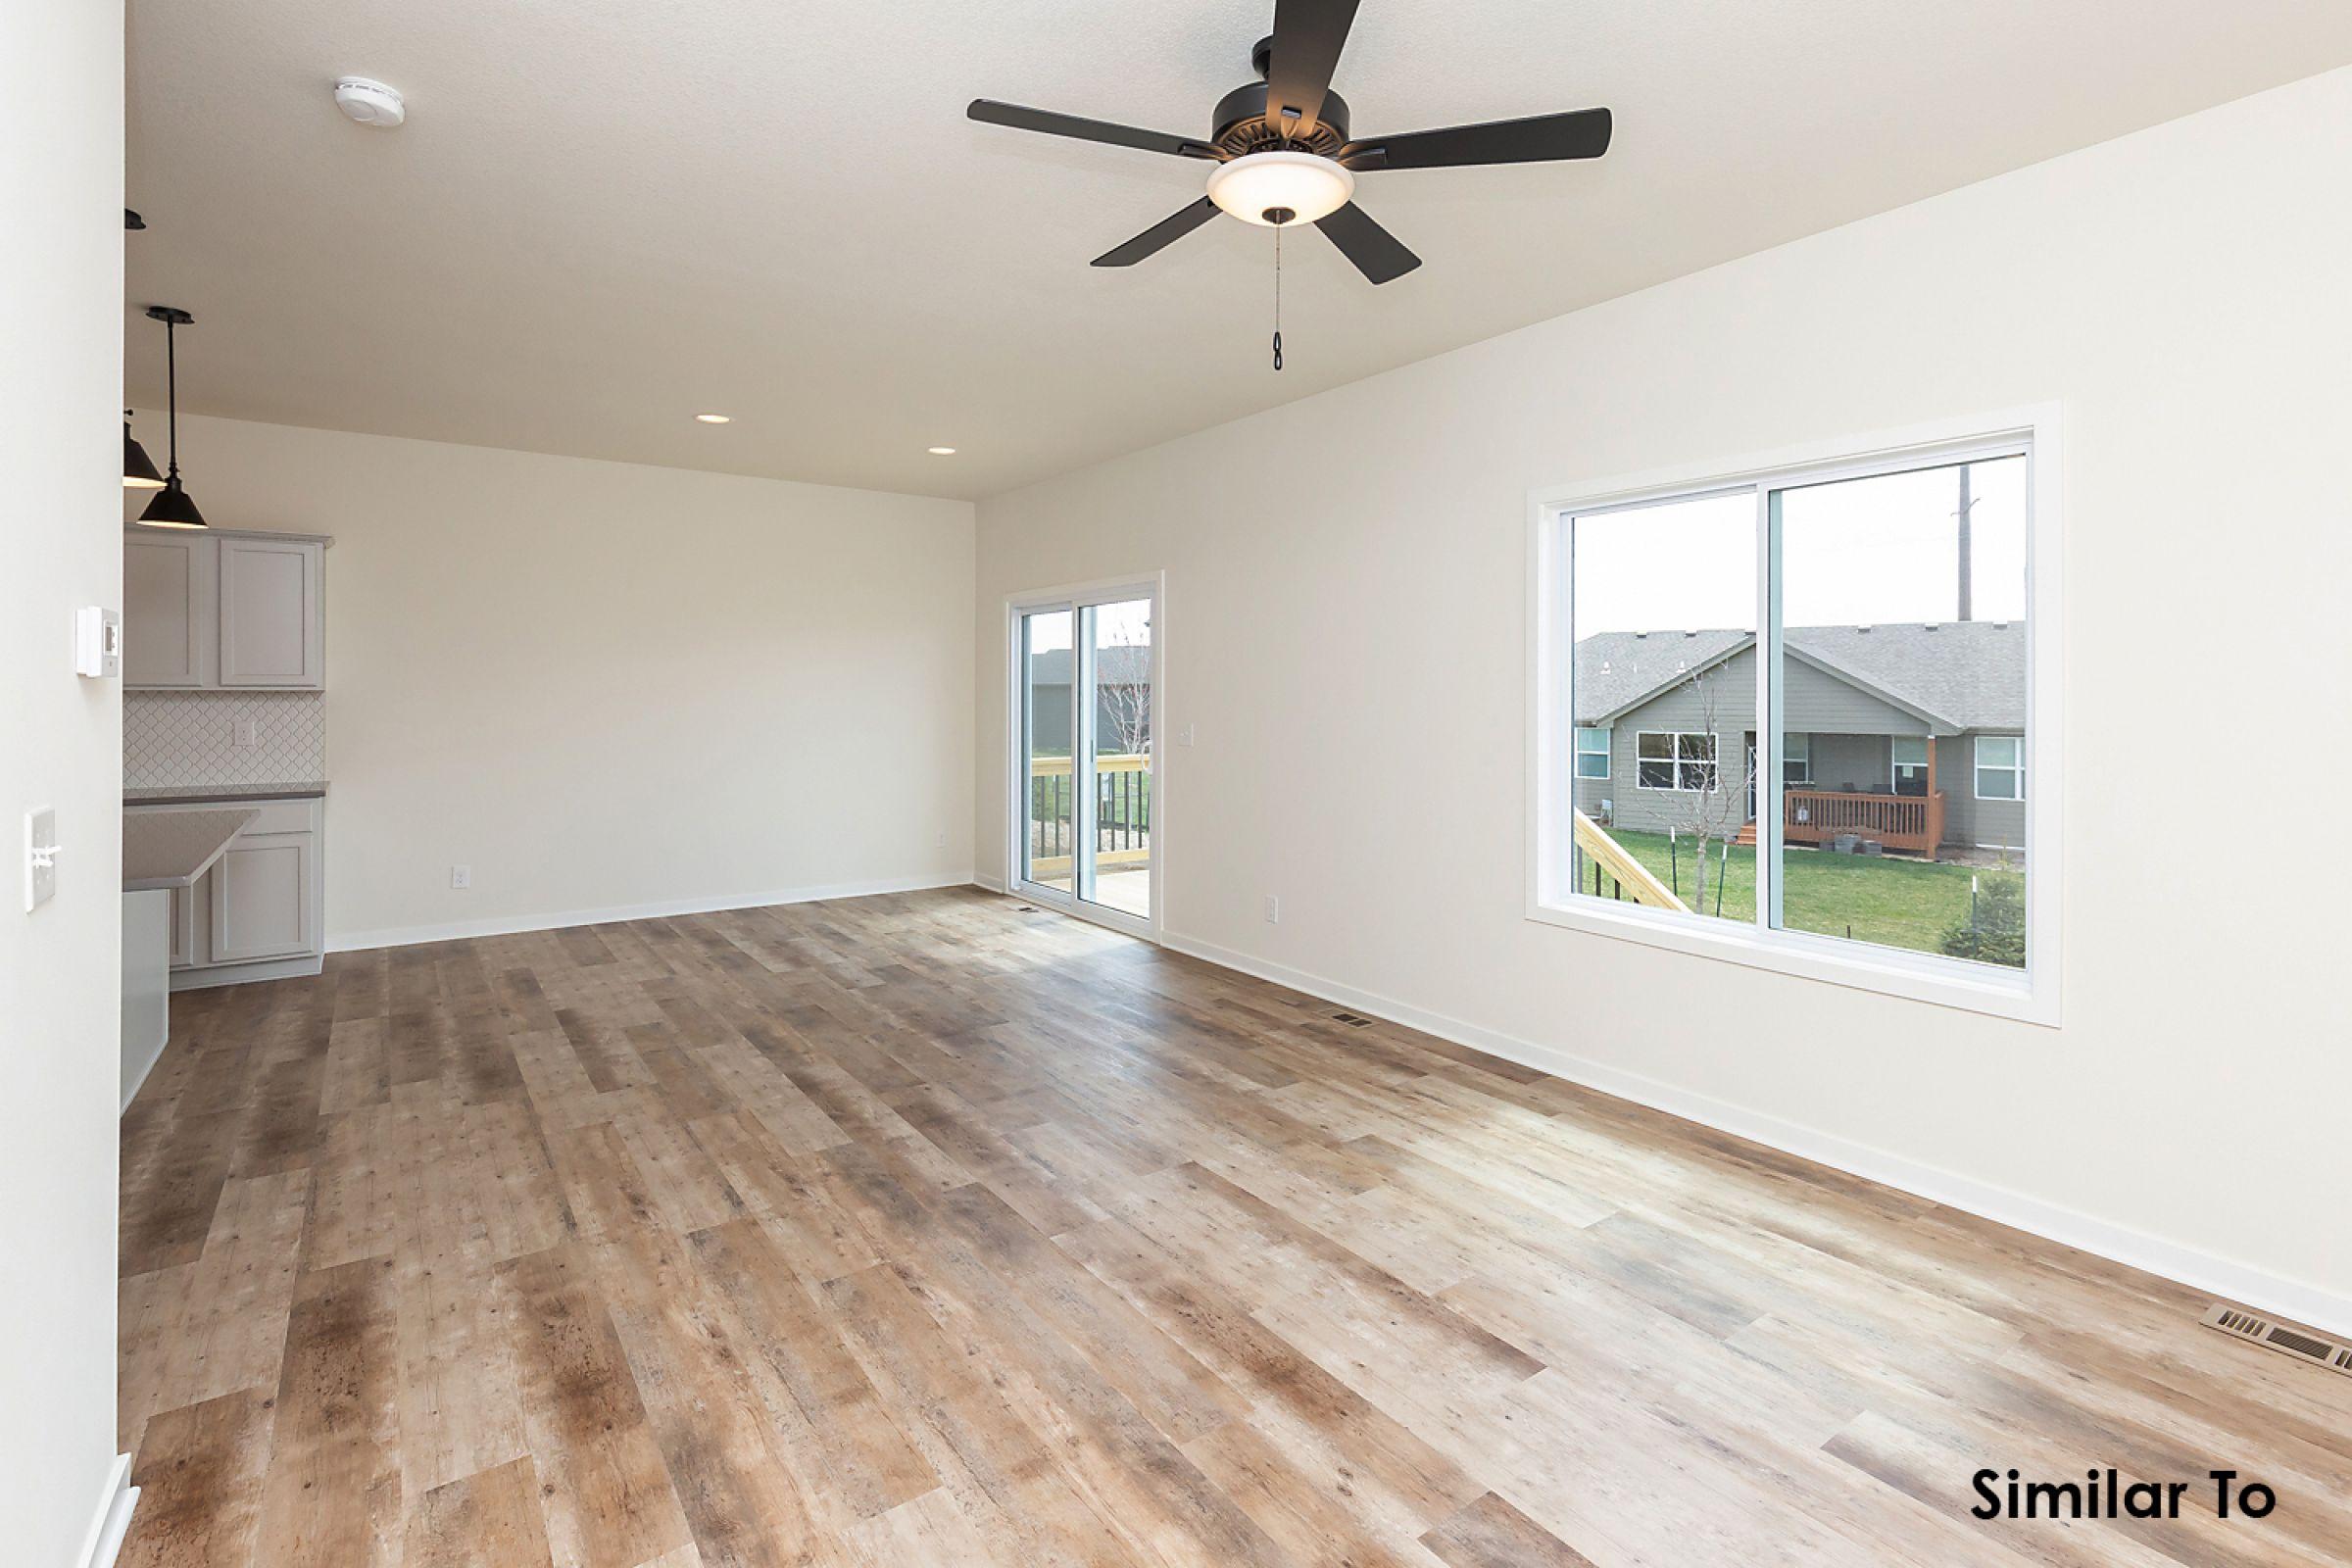 residential-warren-county-iowa-0-acres-listing-number-15134-8-2020-08-27-185027.jpg